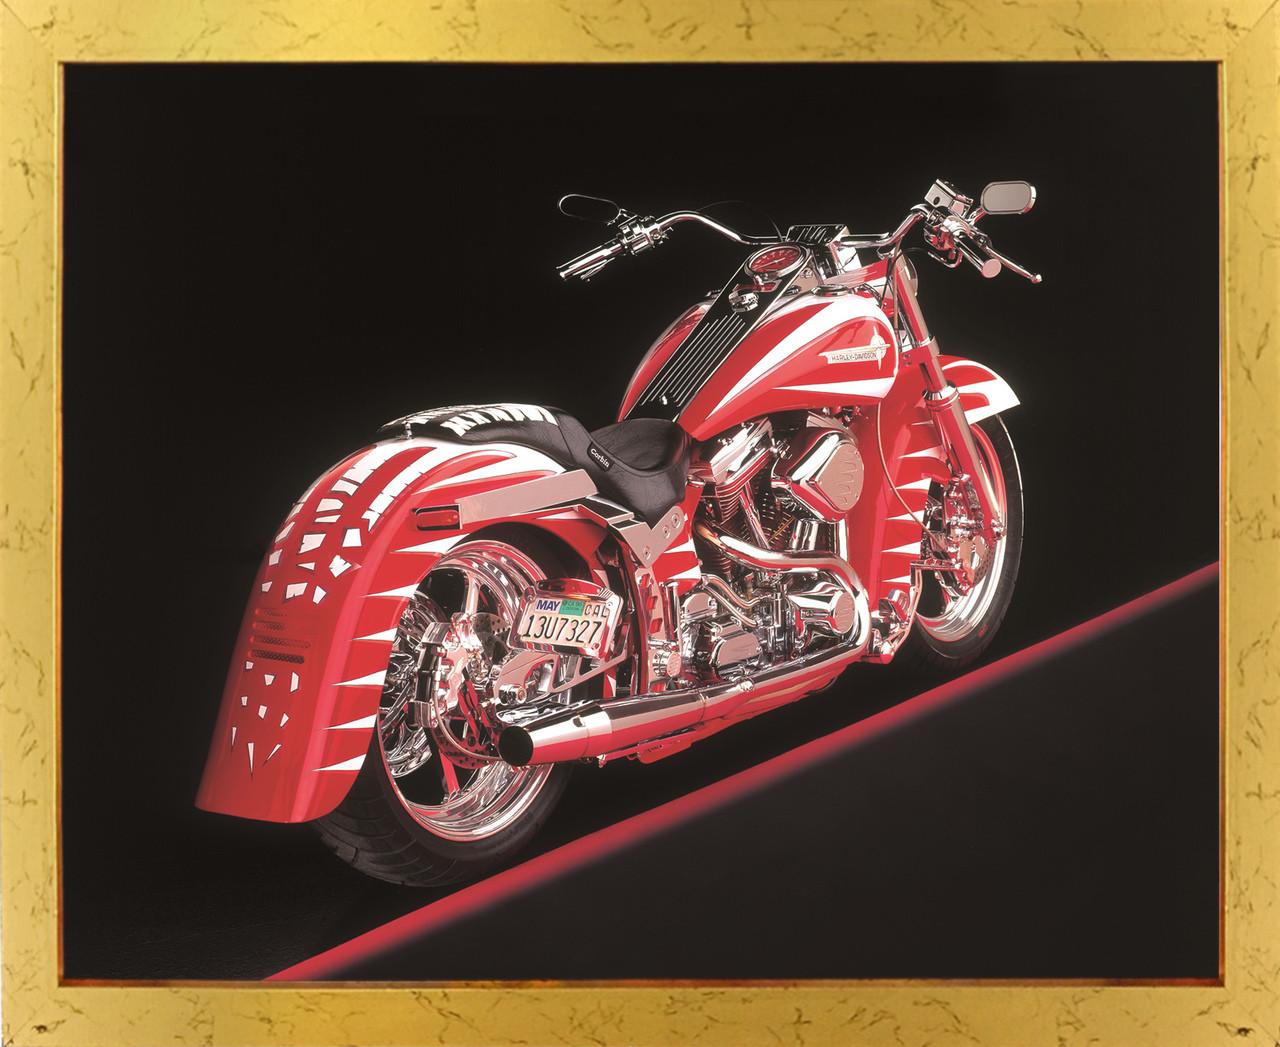 Poster of vintage harley davidson motorcycle golden framed wall decor art print poster 18x24